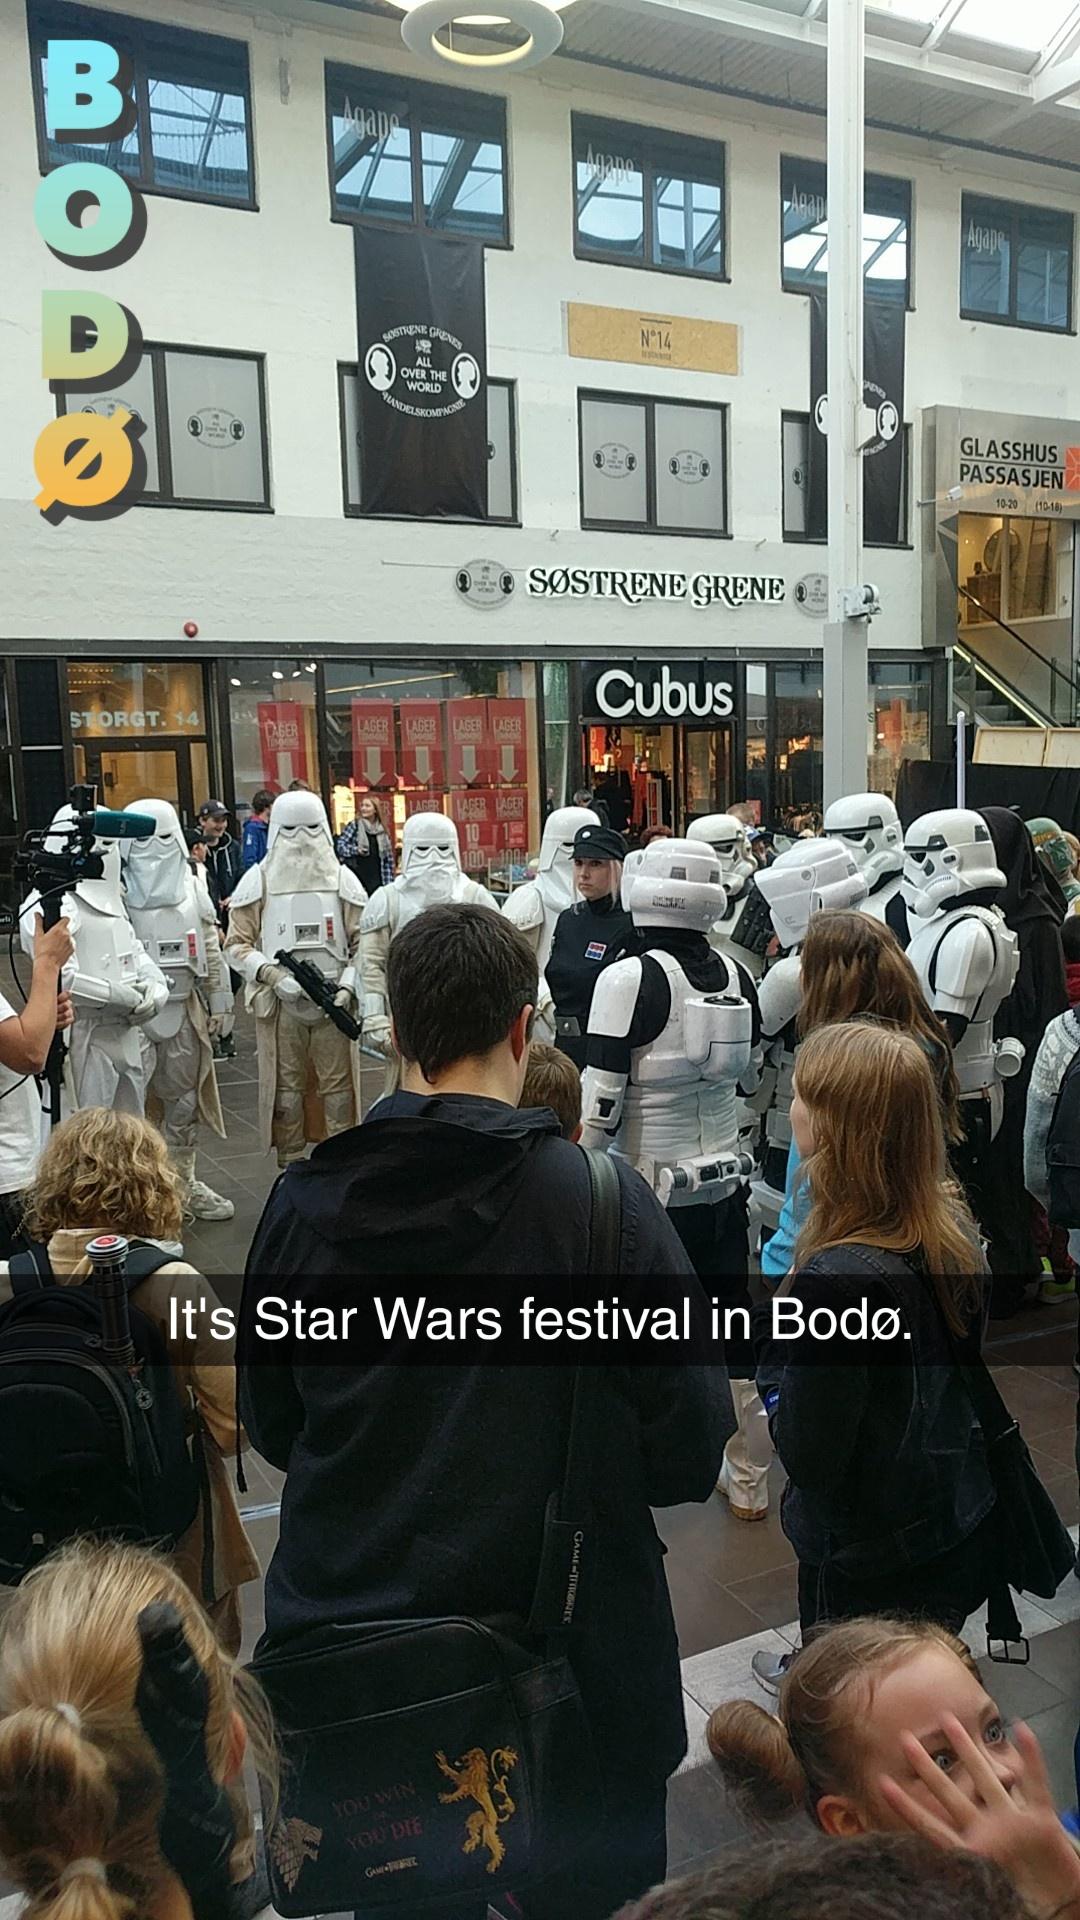 Star Wars fest.